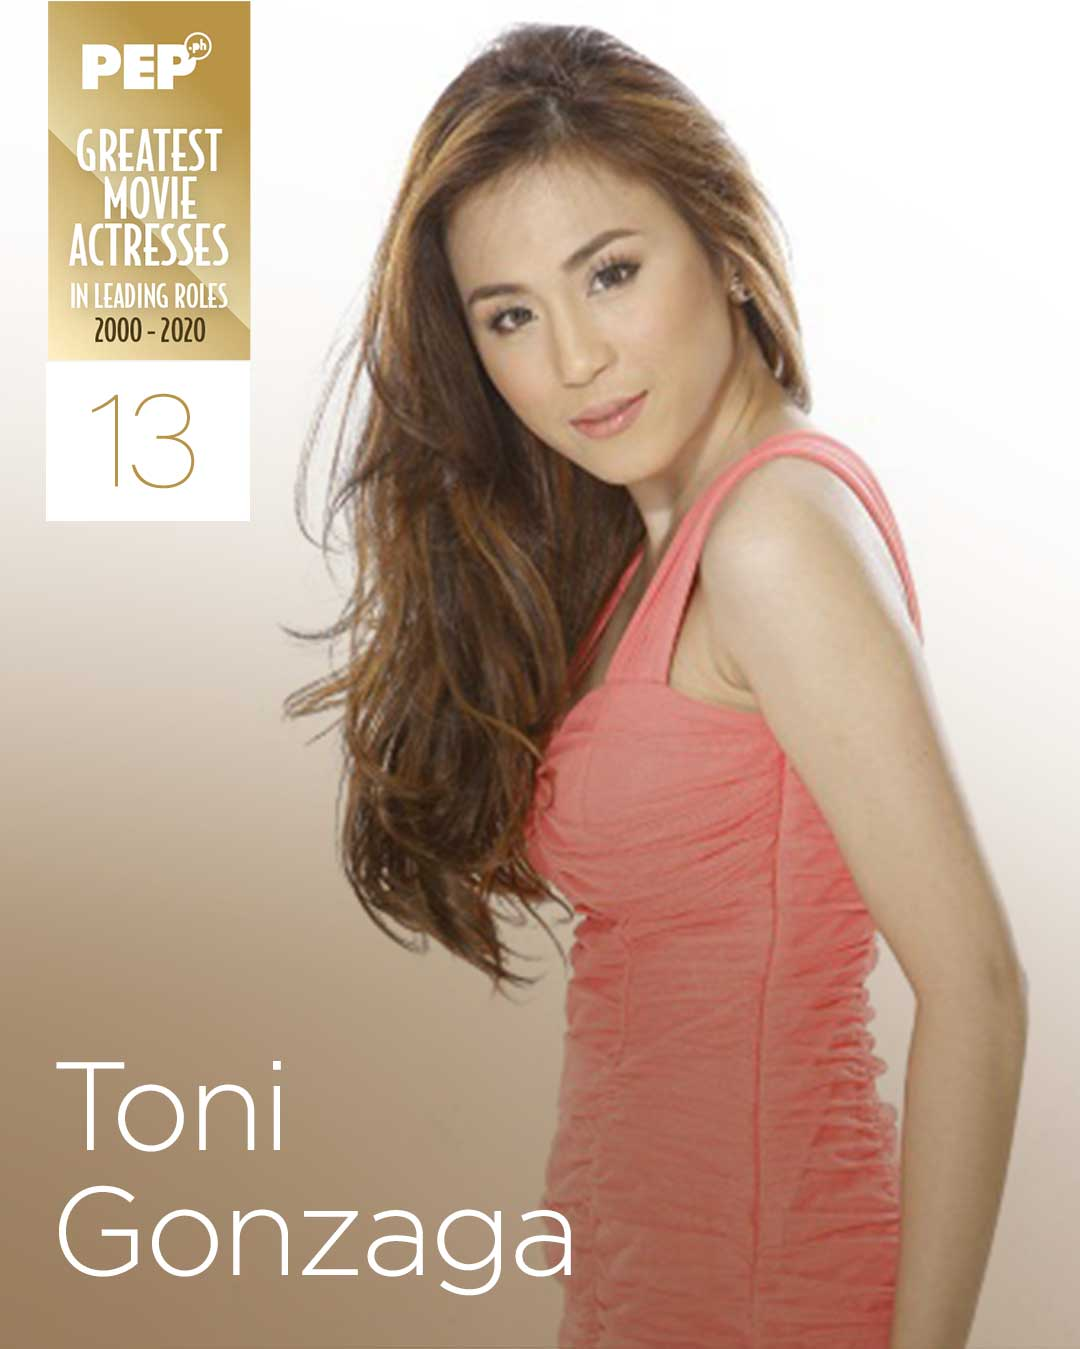 Toni Gonzaga, 15 Greatest Movie Actresses